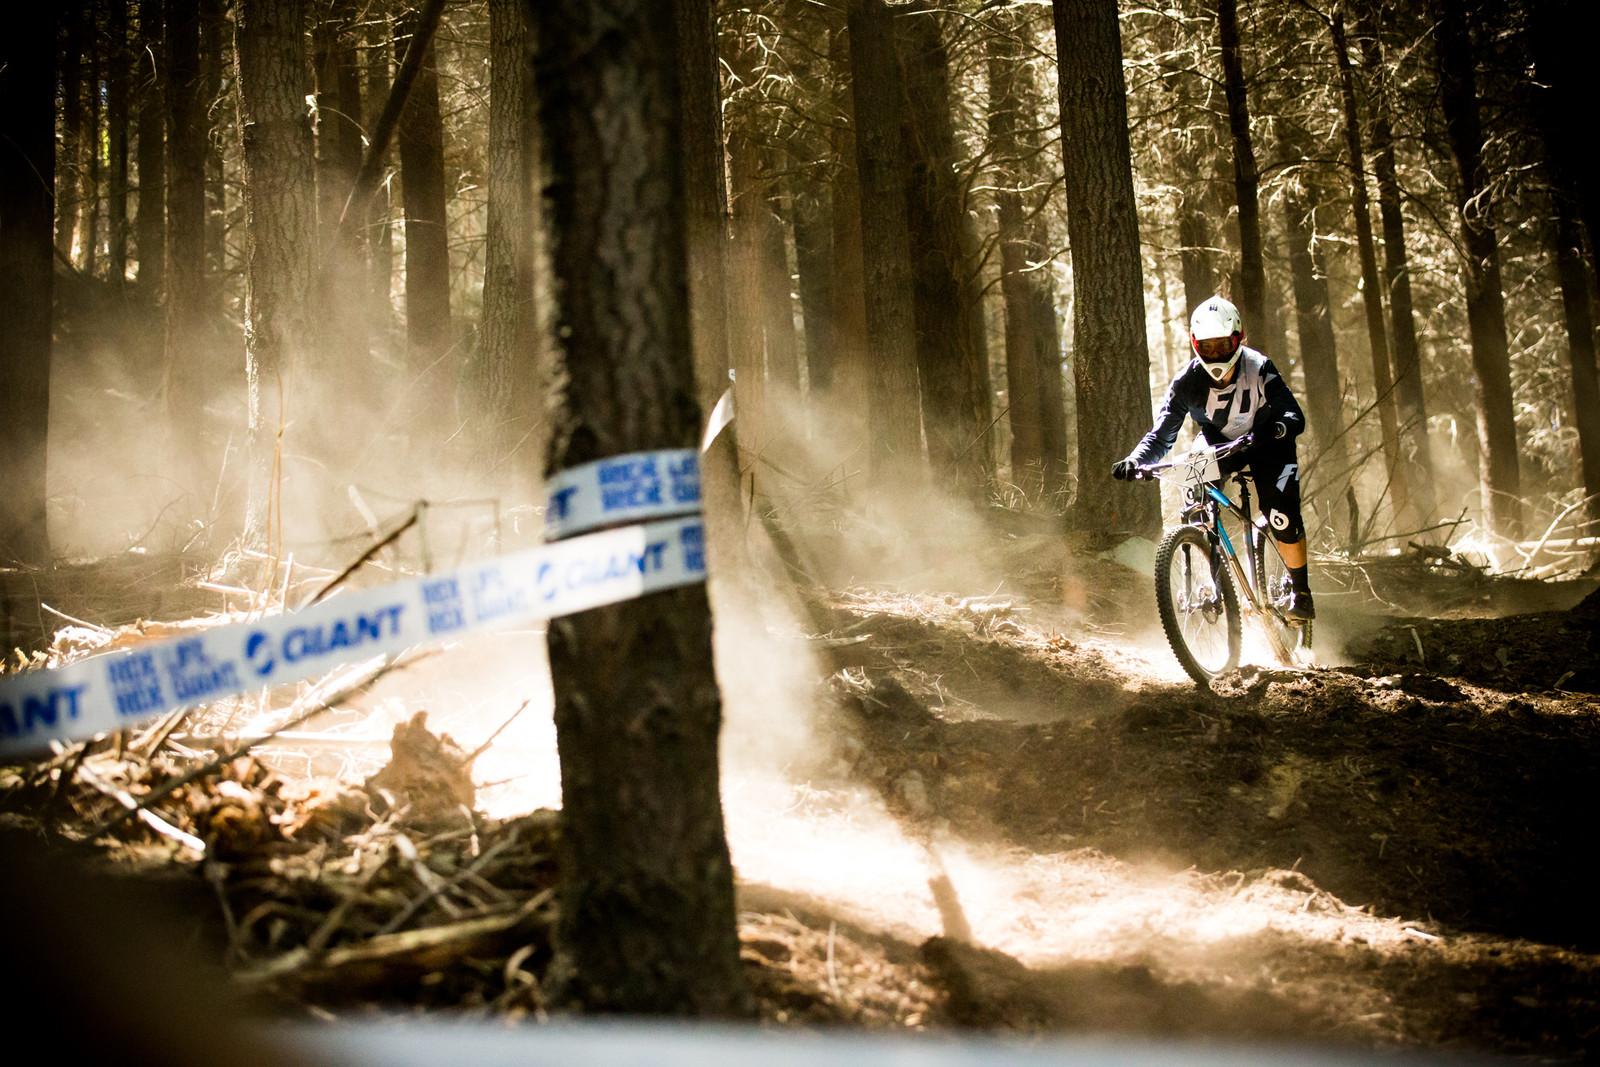 Pete Smoothing Out the Rough - Homegrown NZ Downhill - Vertigo Bikes Ride More DH Series Race 1 - Mountain Biking Pictures - Vital MTB